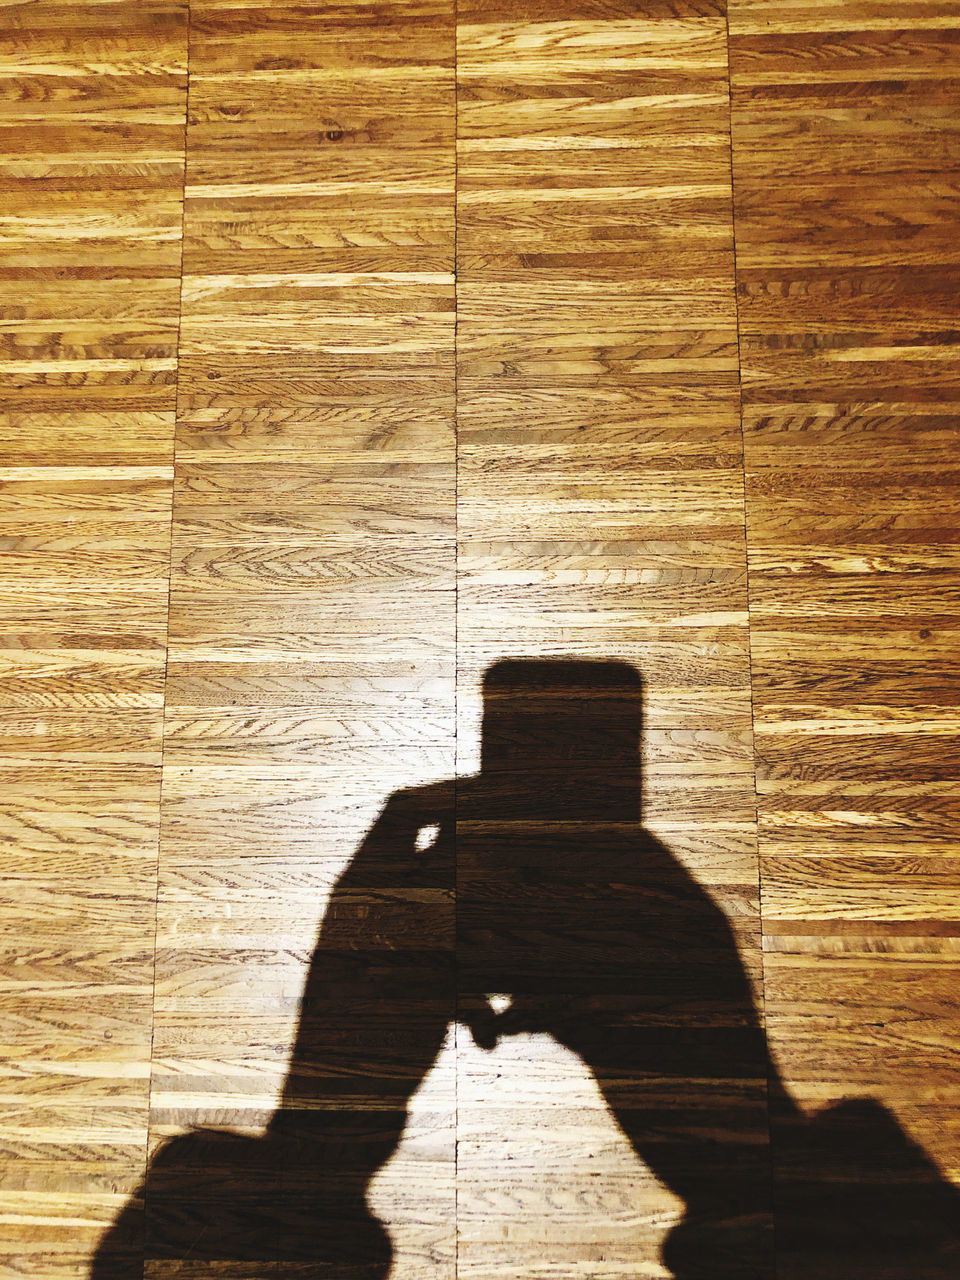 HIGH ANGLE VIEW OF PERSON SHADOW ON HARDWOOD FLOOR